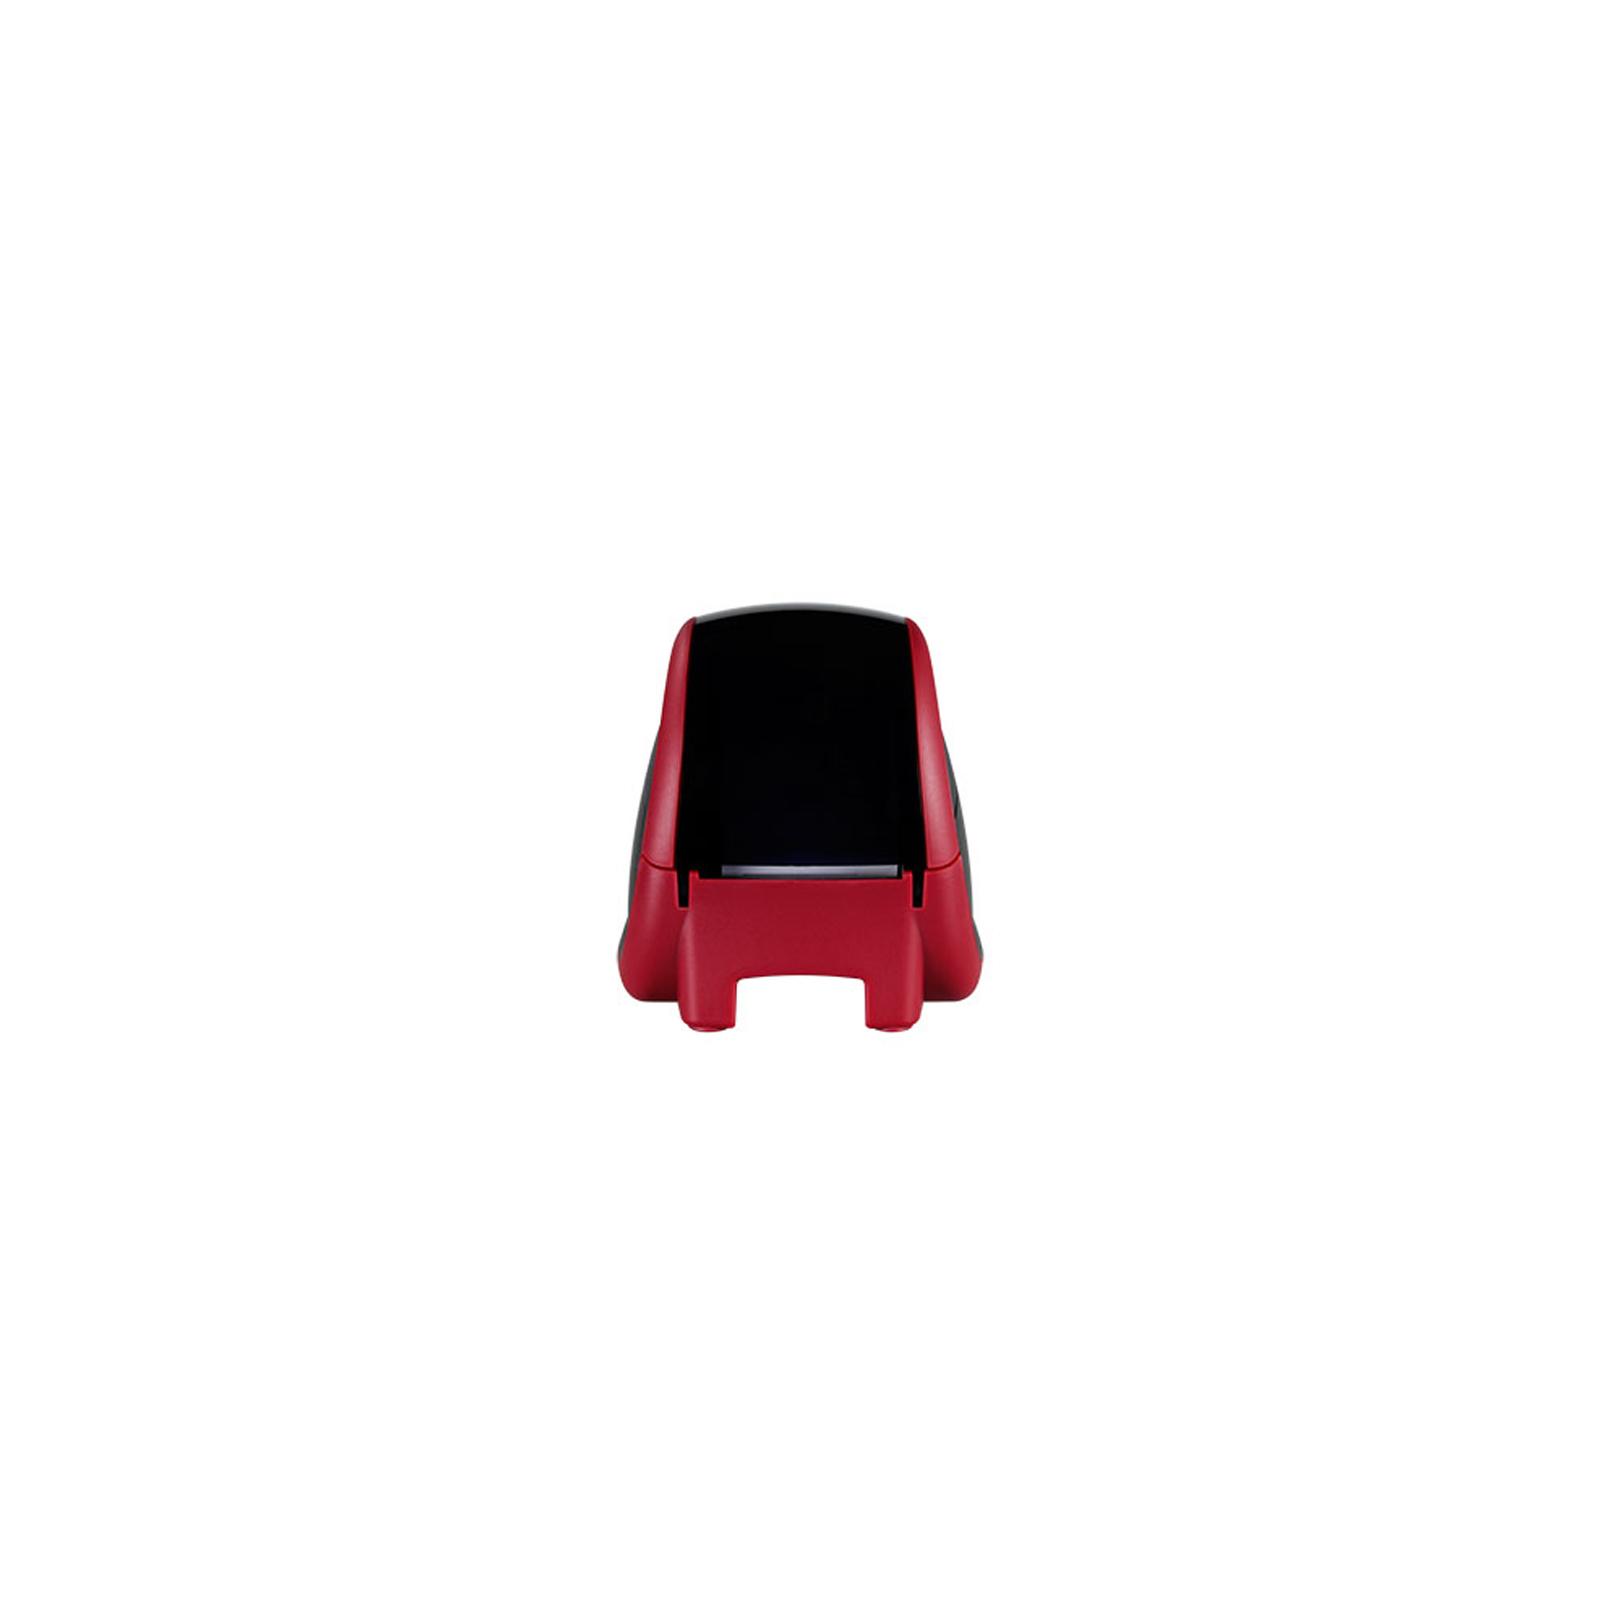 Принтер этикеток HPRT LPQ58 Red_Black (8933) изображение 4